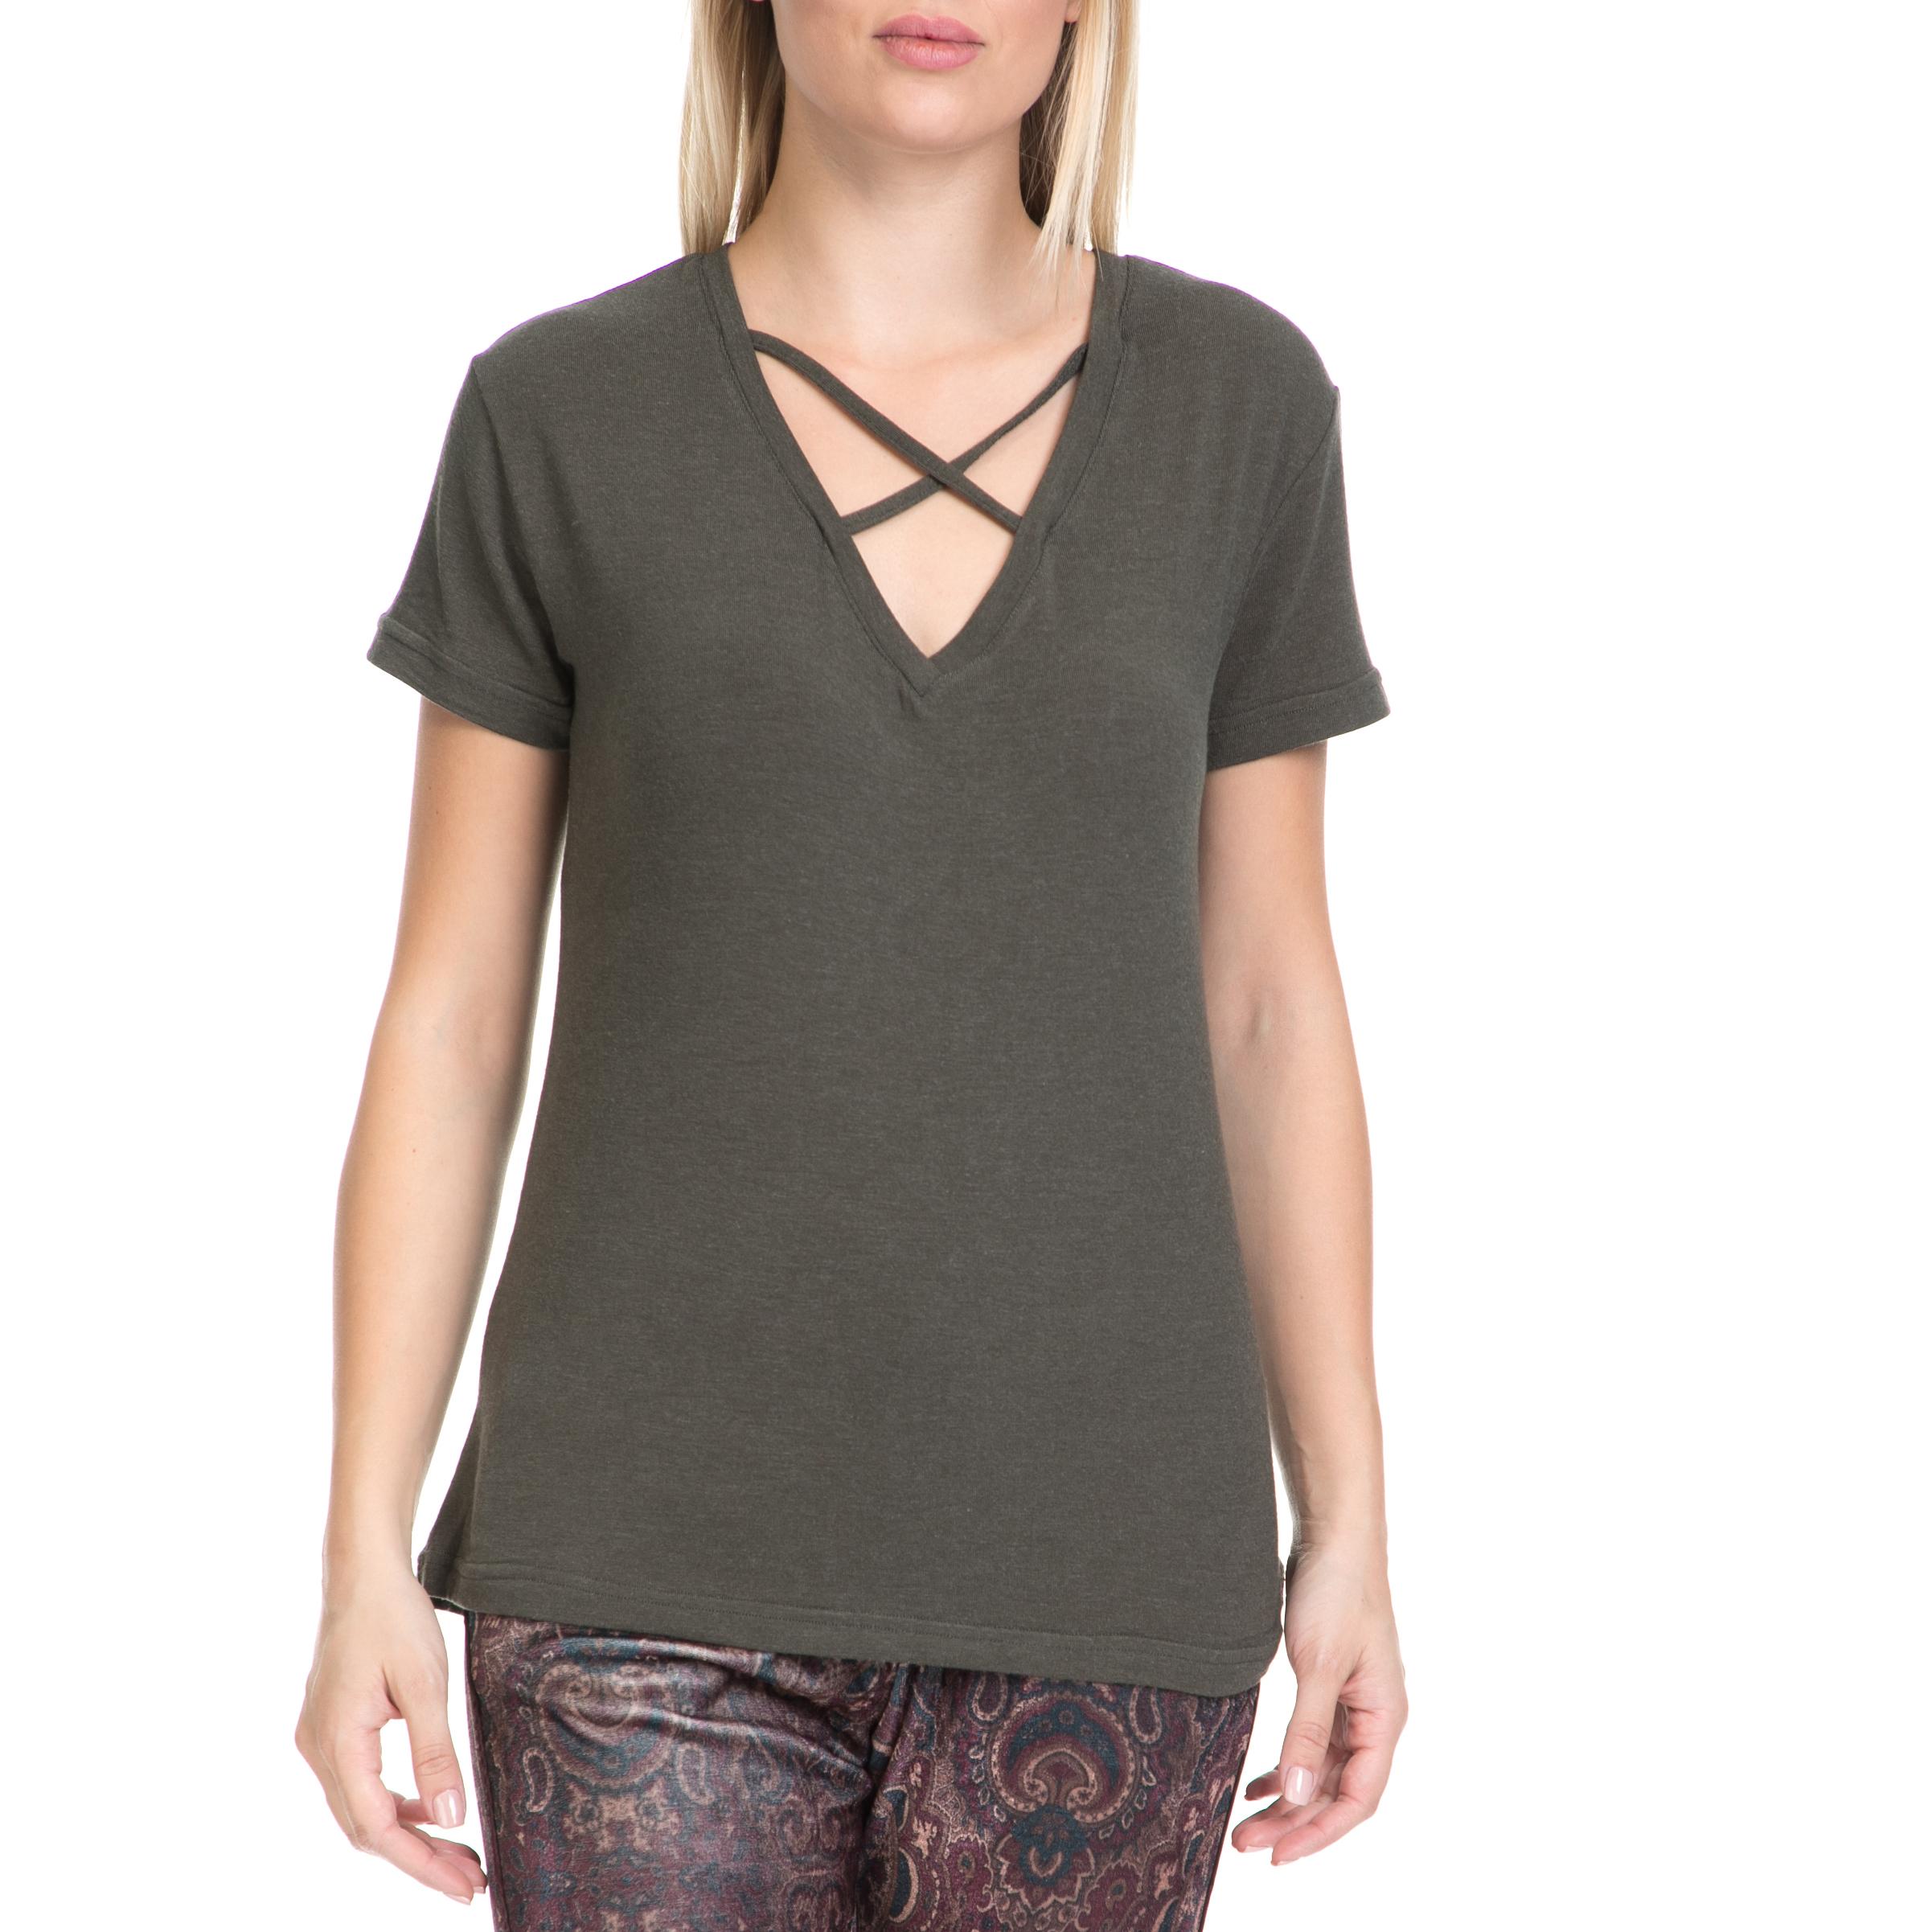 MYMOO - Γυναικείο T-shirt MYMOO λαδί γυναικεία ρούχα μπλούζες t shirt